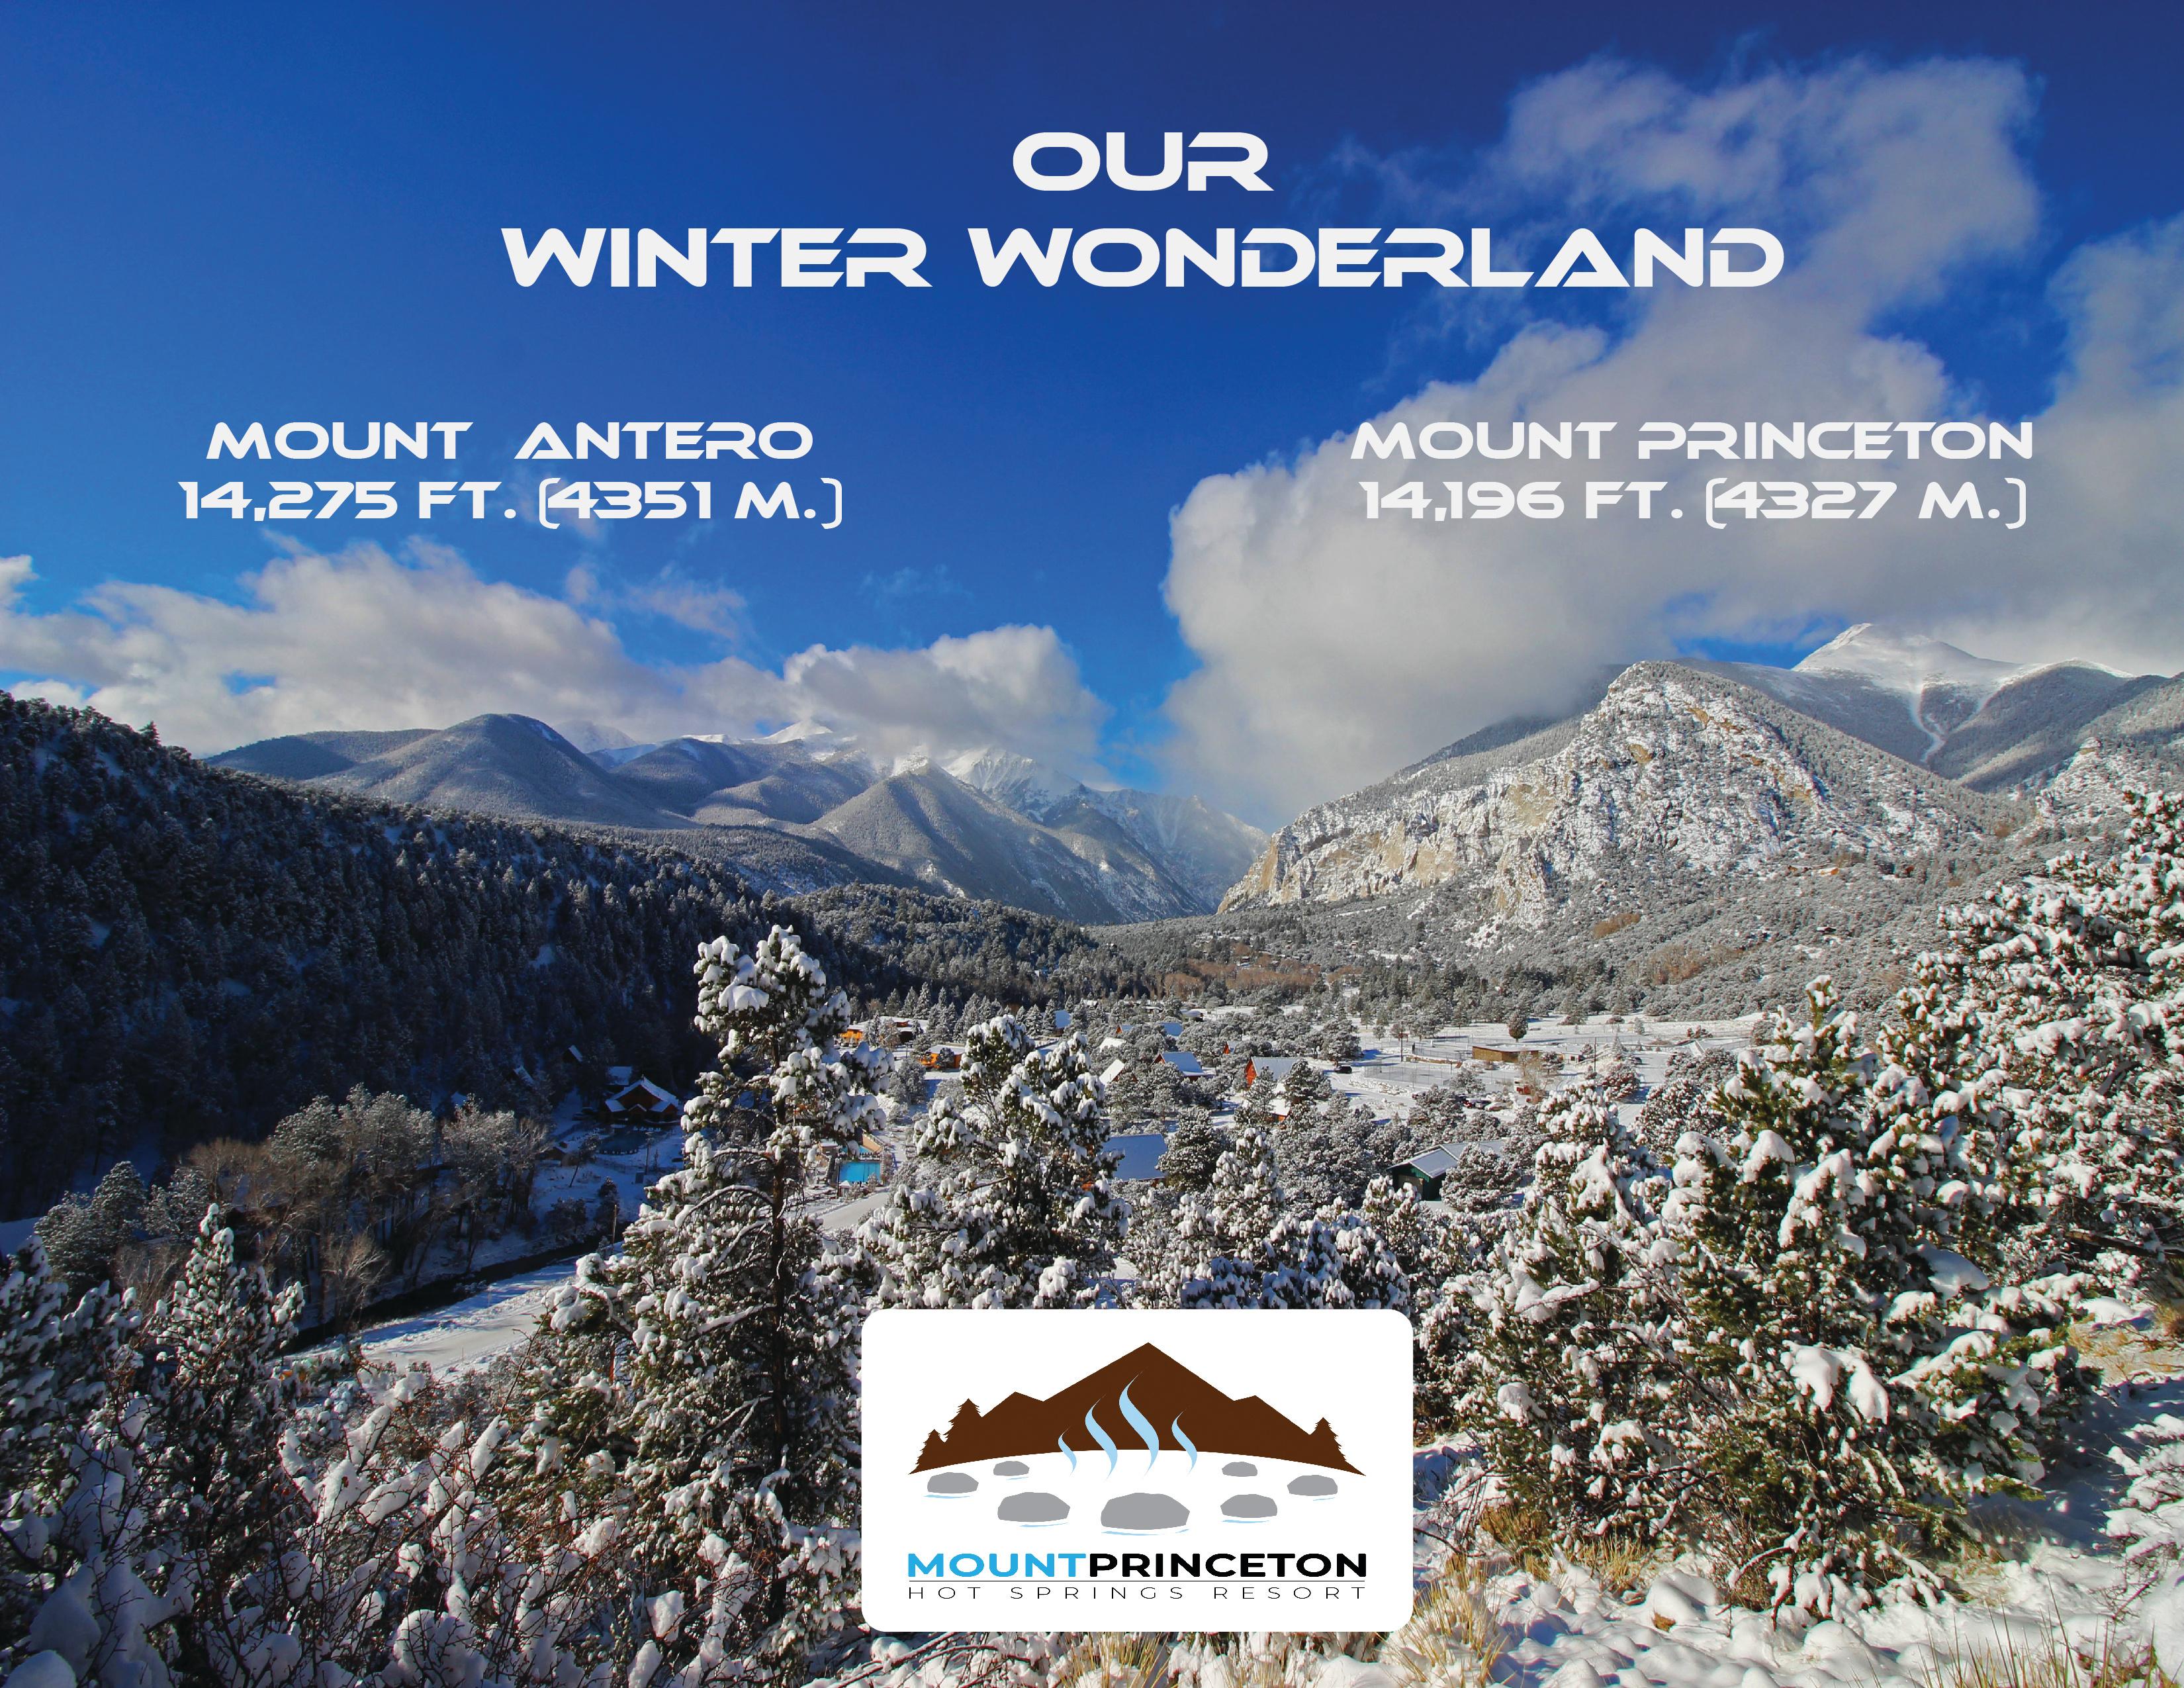 Mt Princeton WINTER  wText 23.jpg